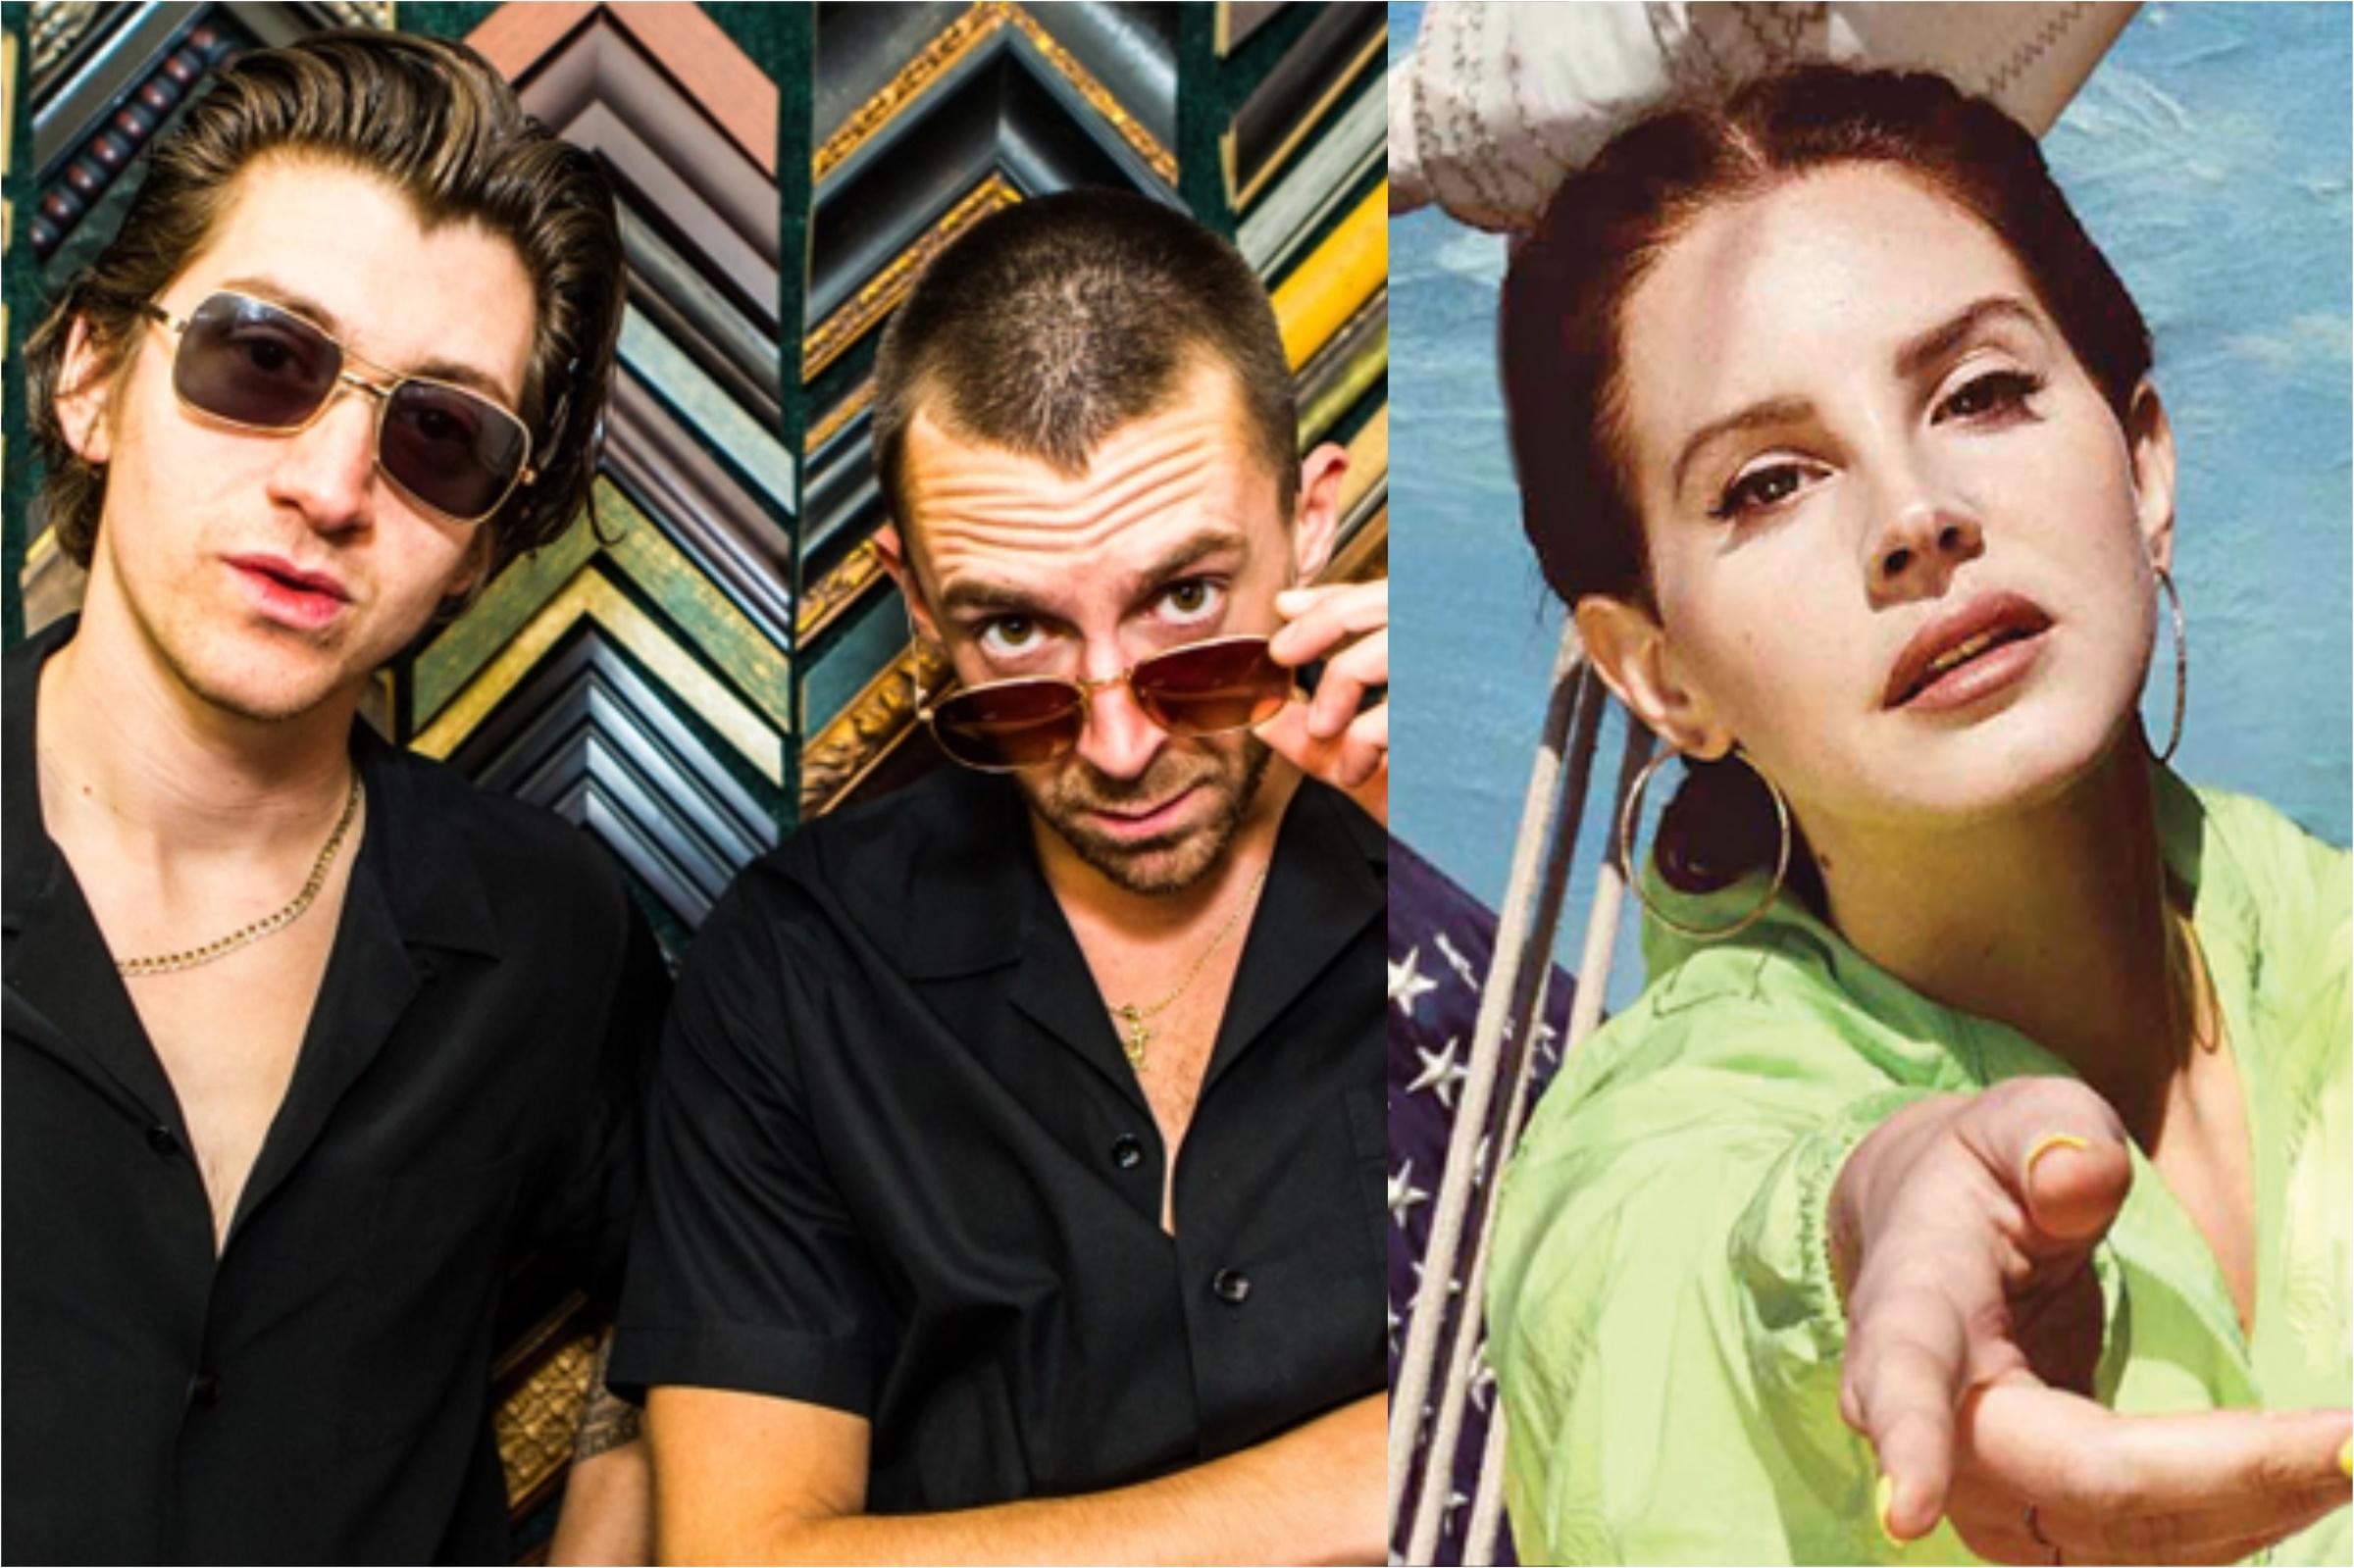 Vazou! Parceria de Lana Del Rey e The Last Shadow Puppets surge na internet